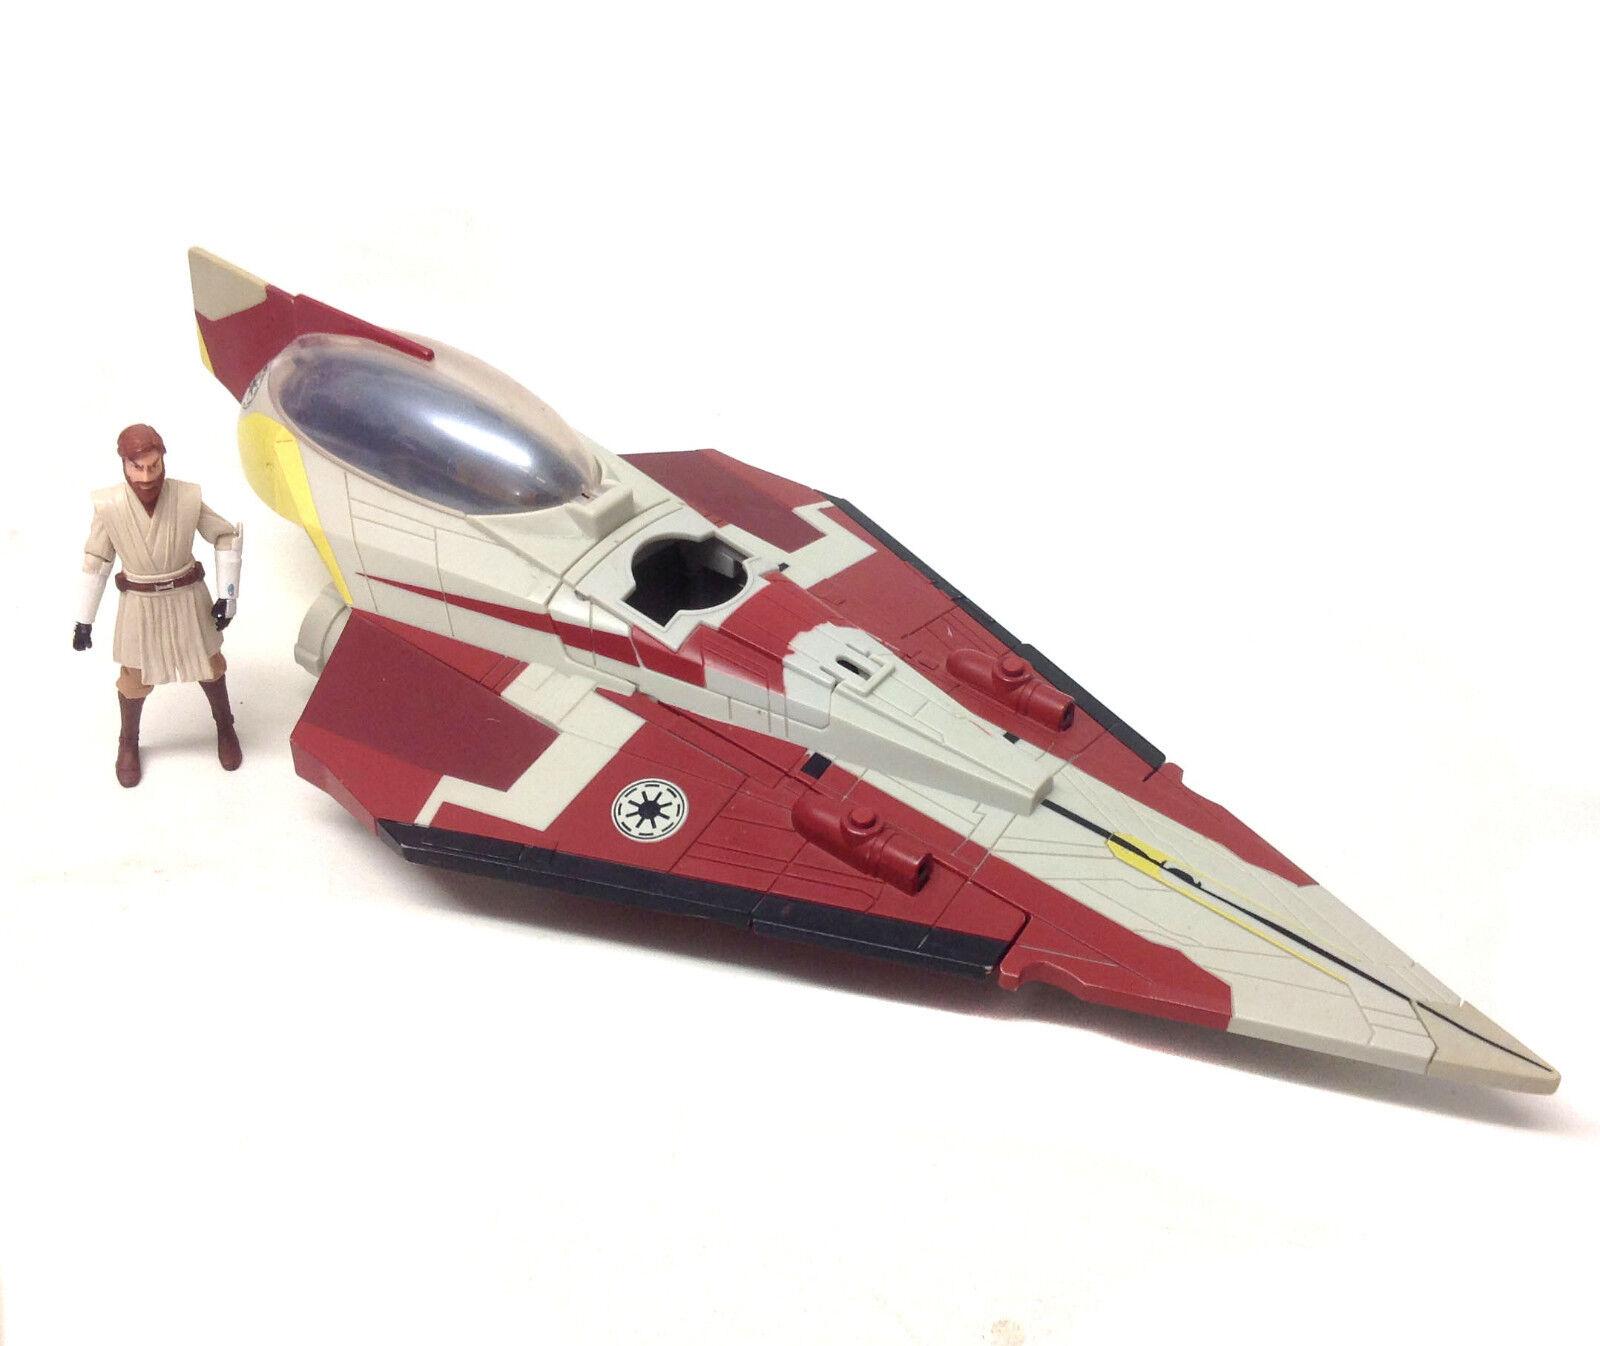 STAR STAR STAR WARS Clone Wars OBI WAN's JEDI FIGHTER 2 part ship vehicle toy & figure set 9bafad